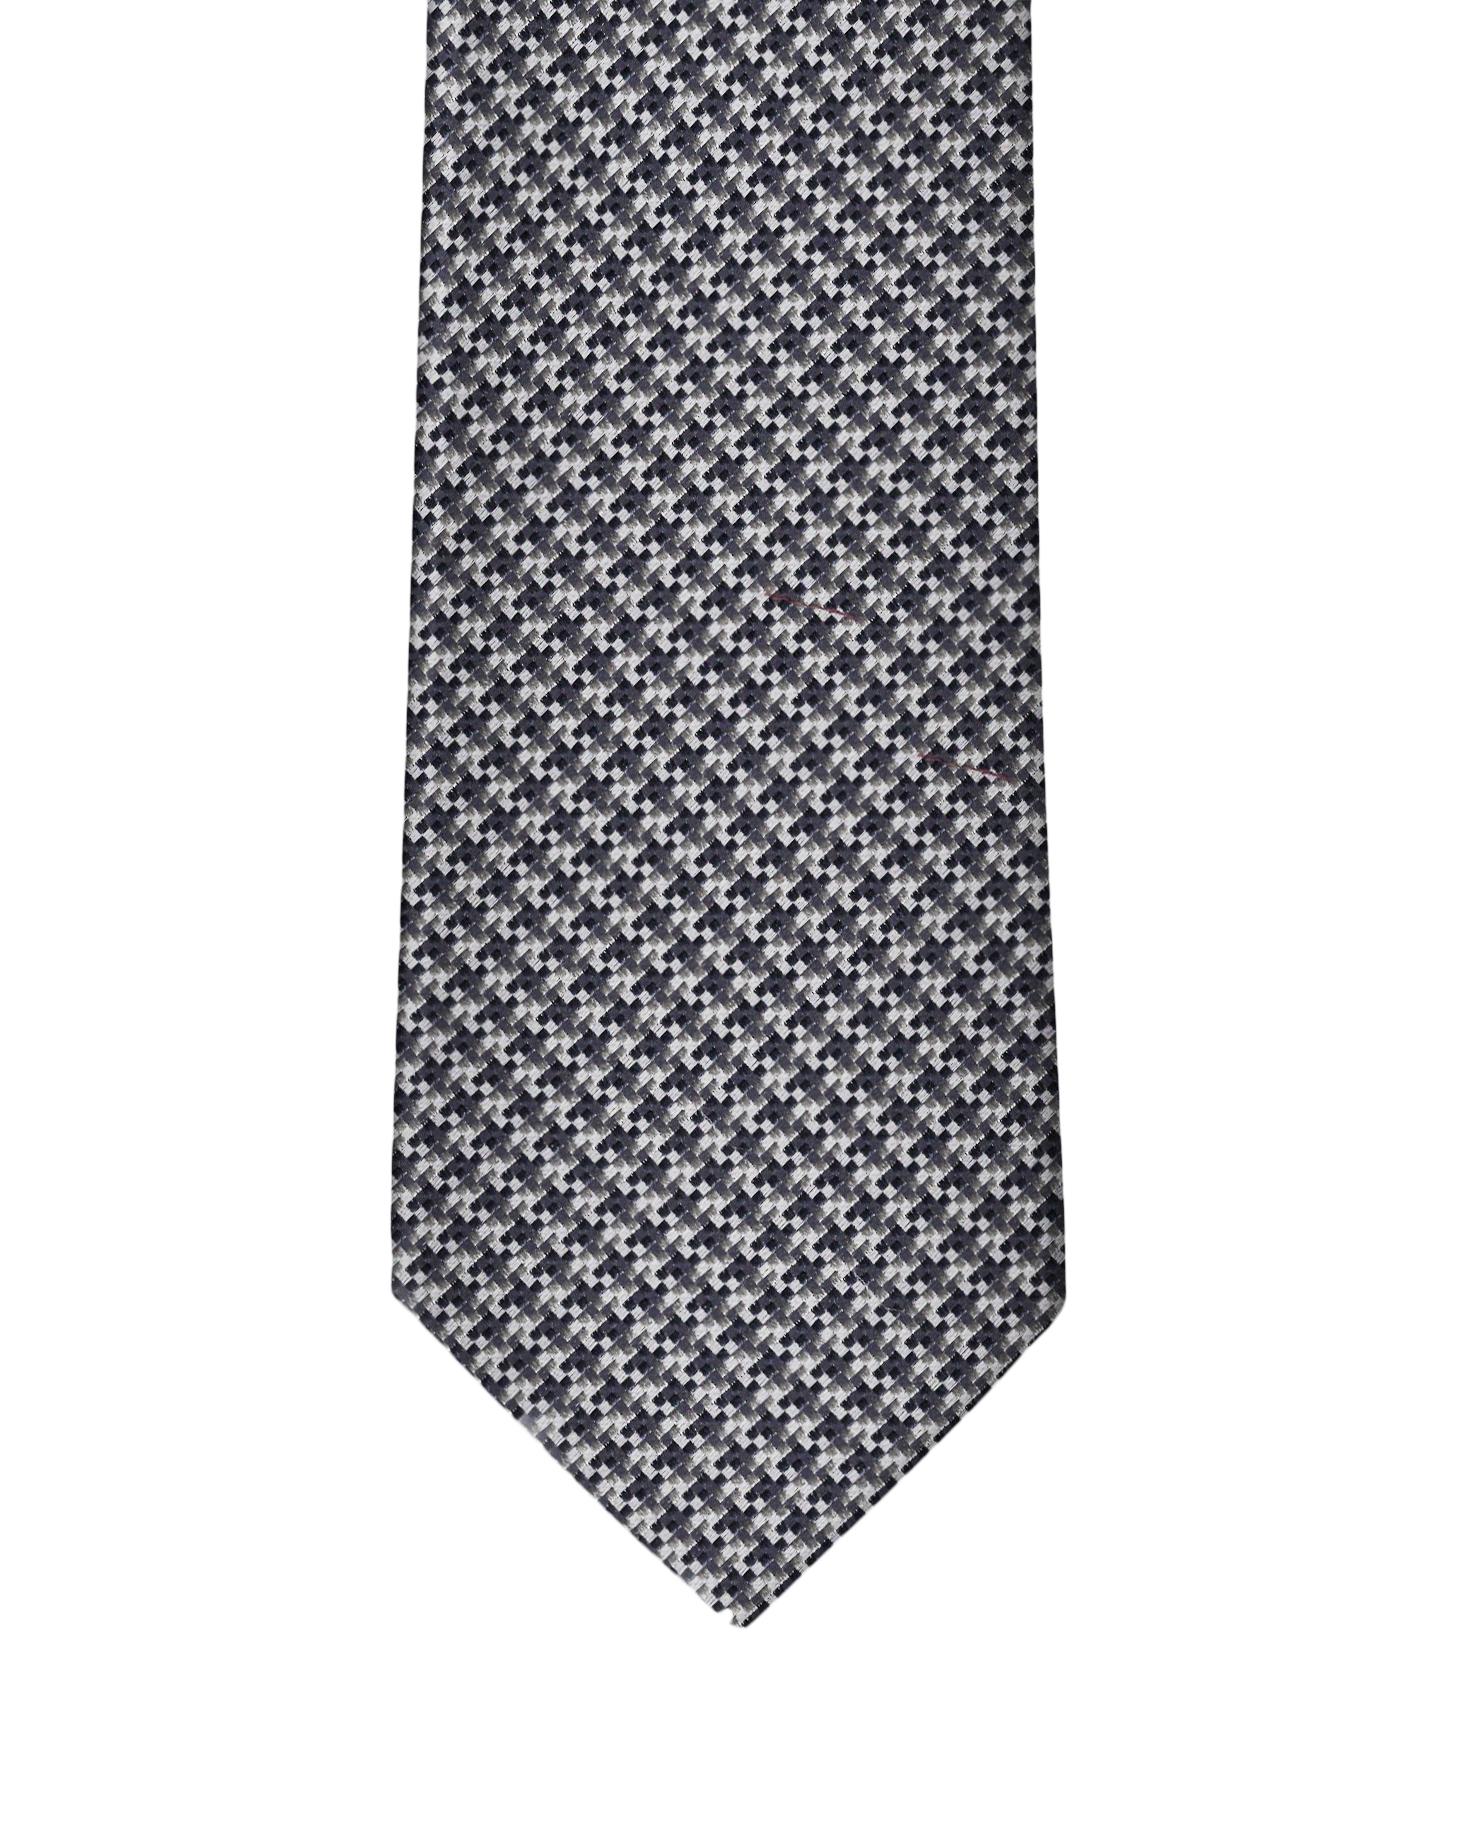 Navy & White Micro Houndstooth Necktie